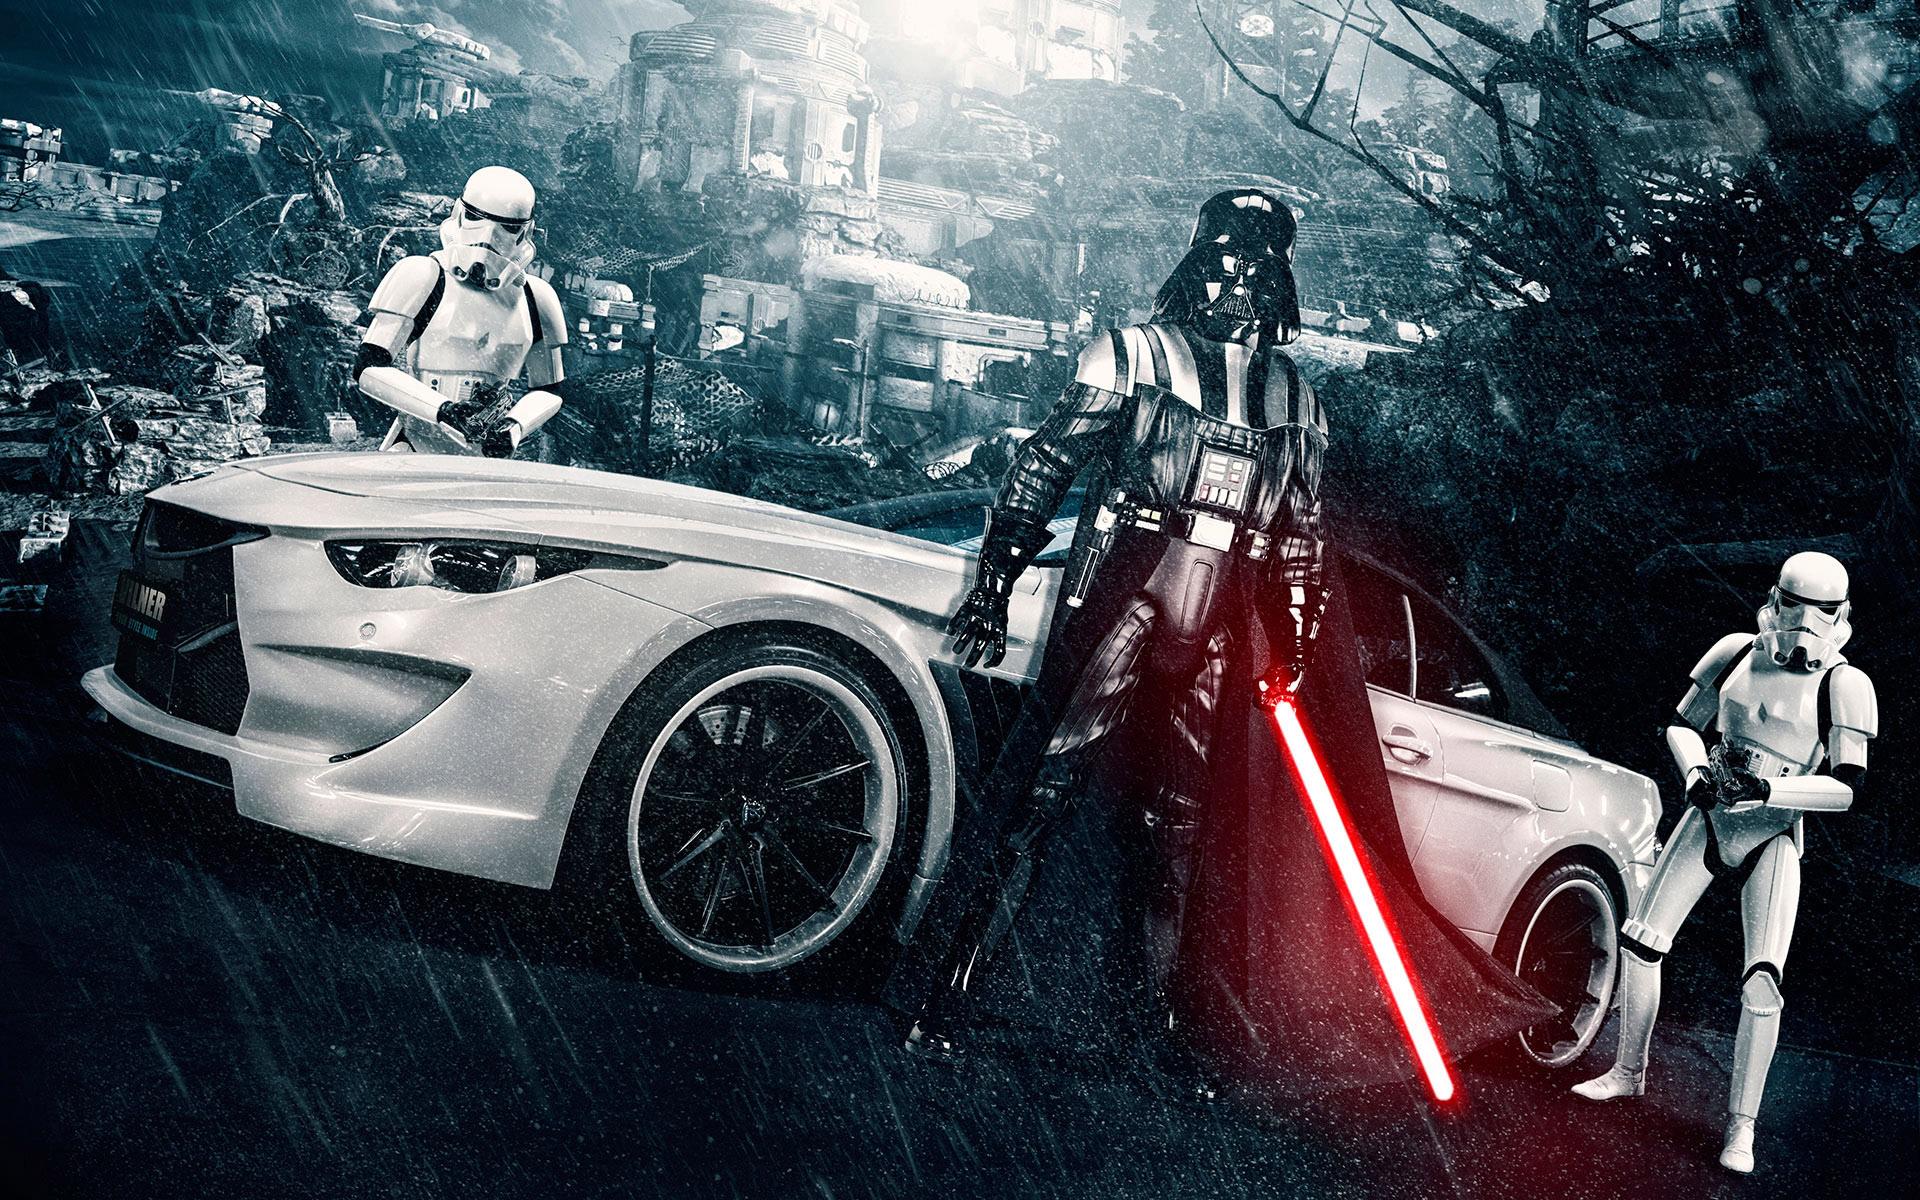 Vilner Bmw Stormtrooper Wallpaper Hd Car Wallpapers